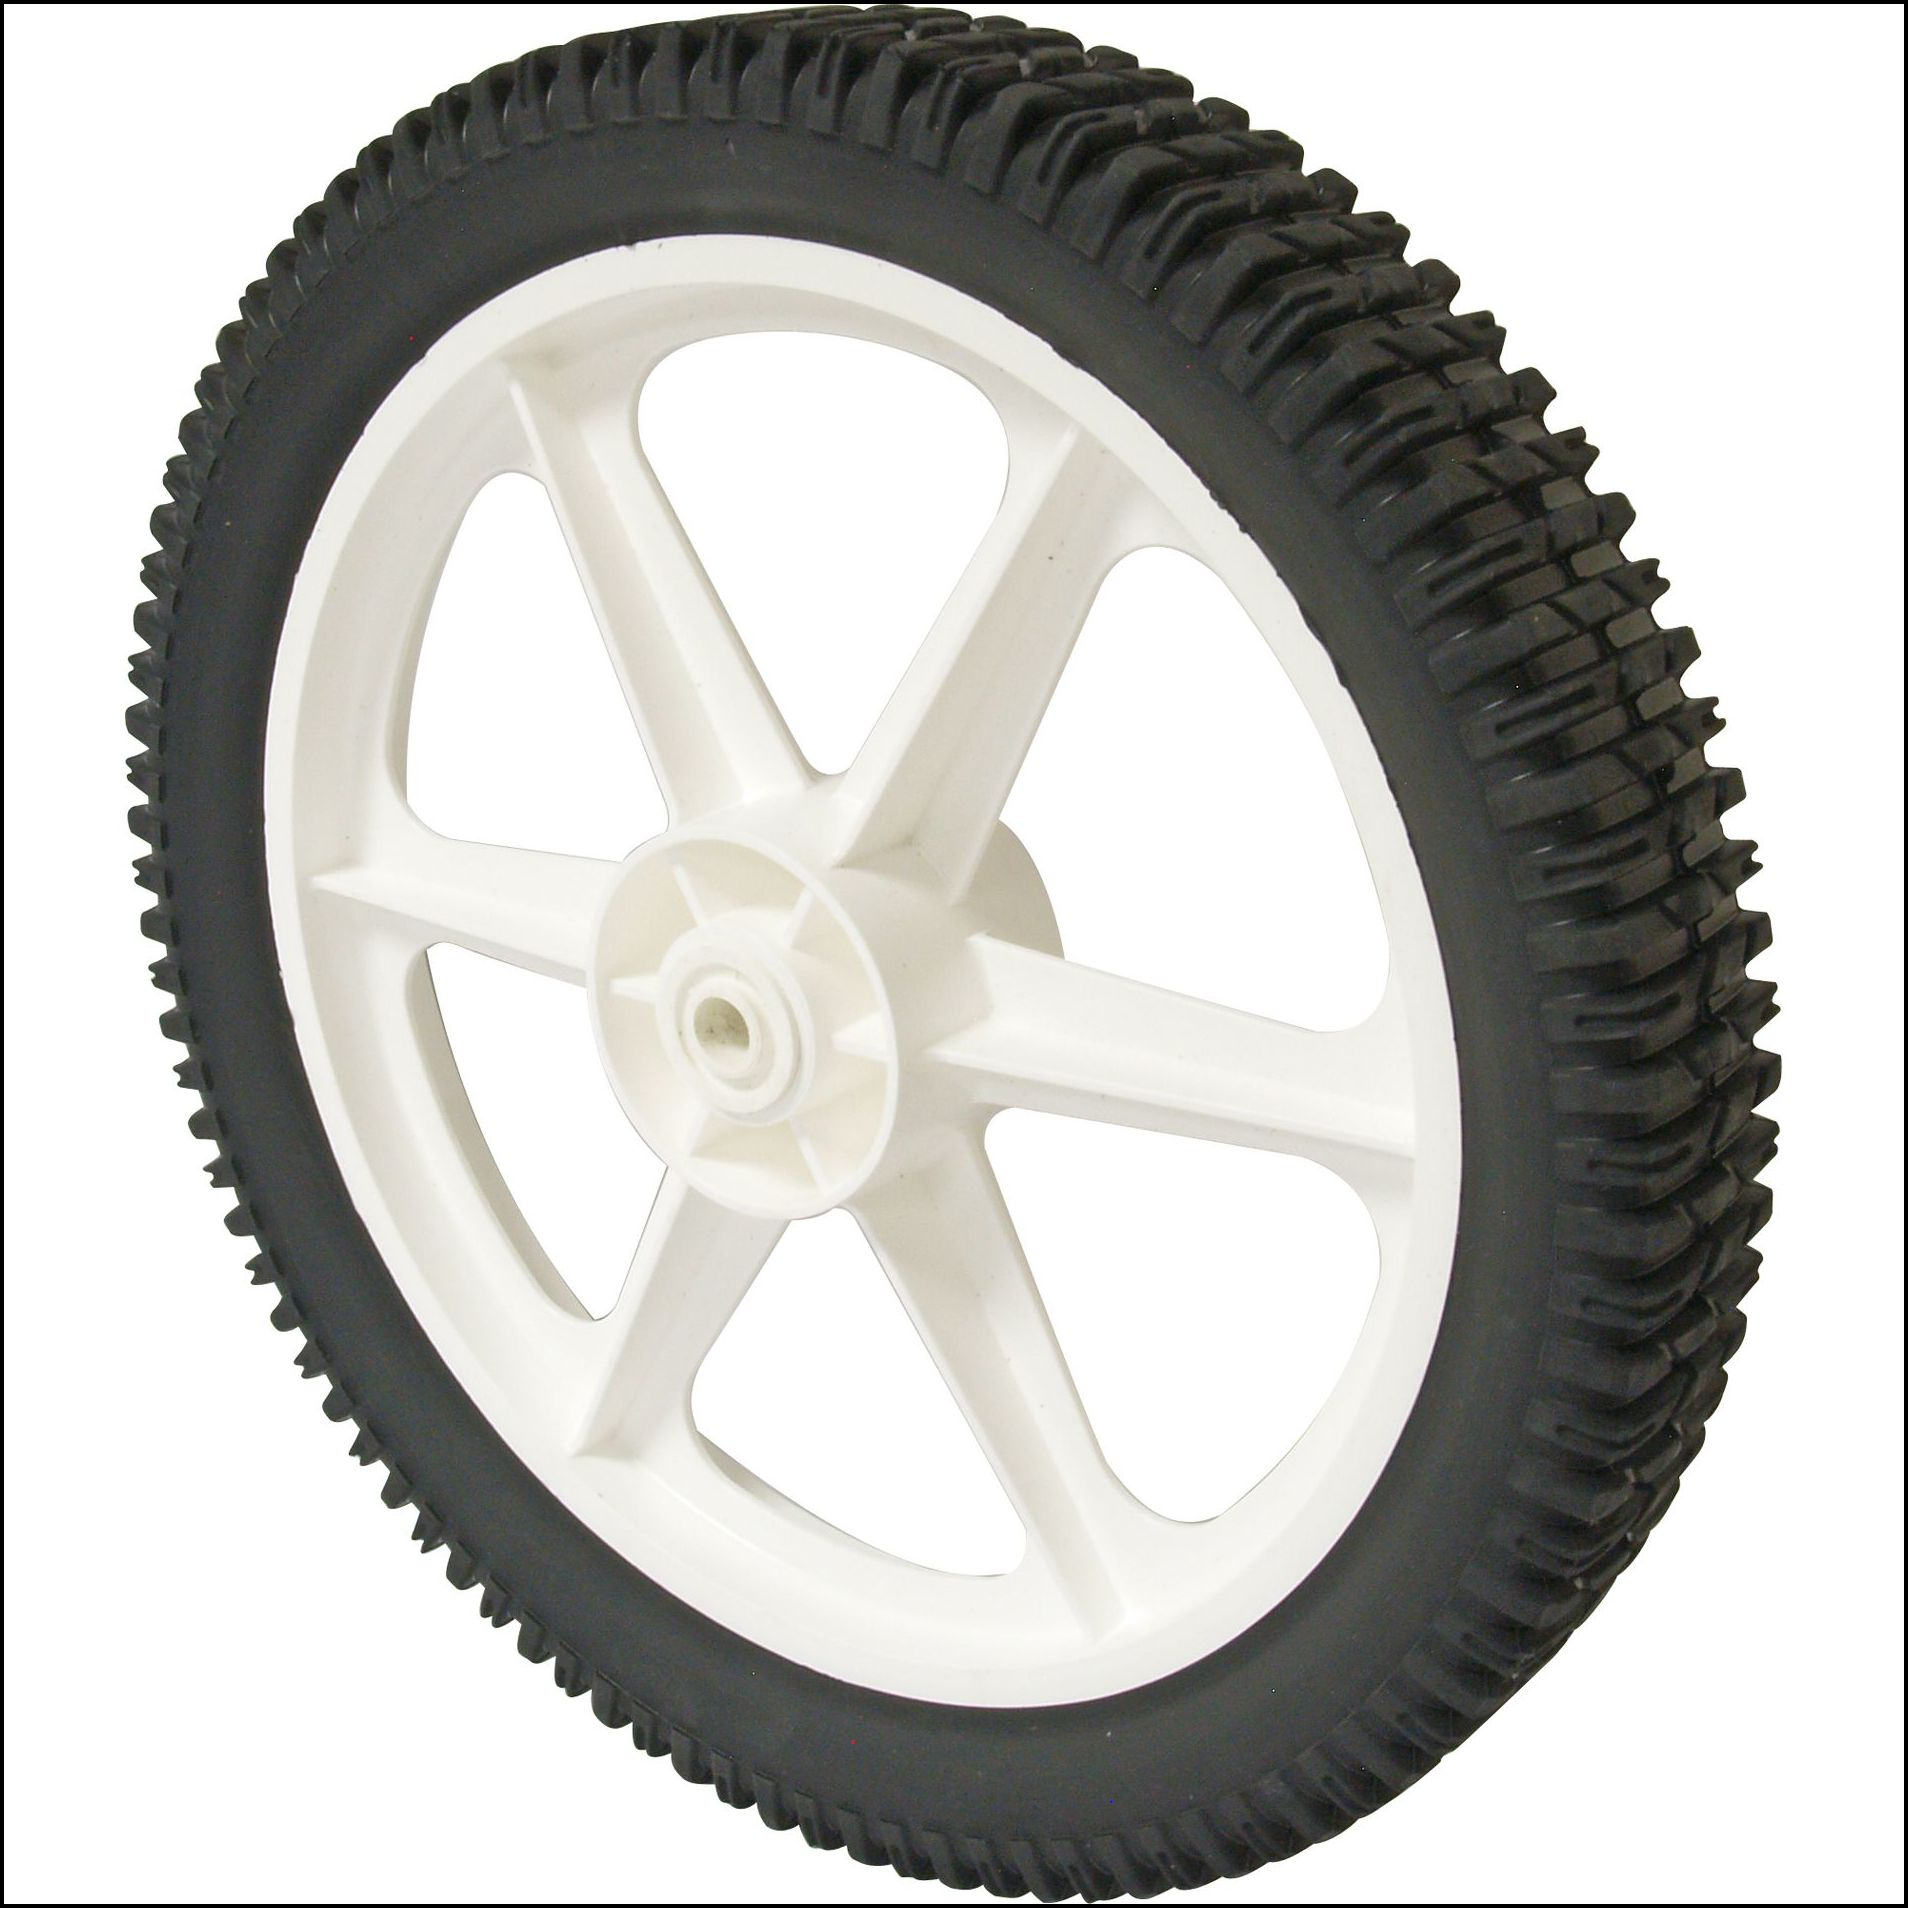 12 Inch Lawn Mower Wheels